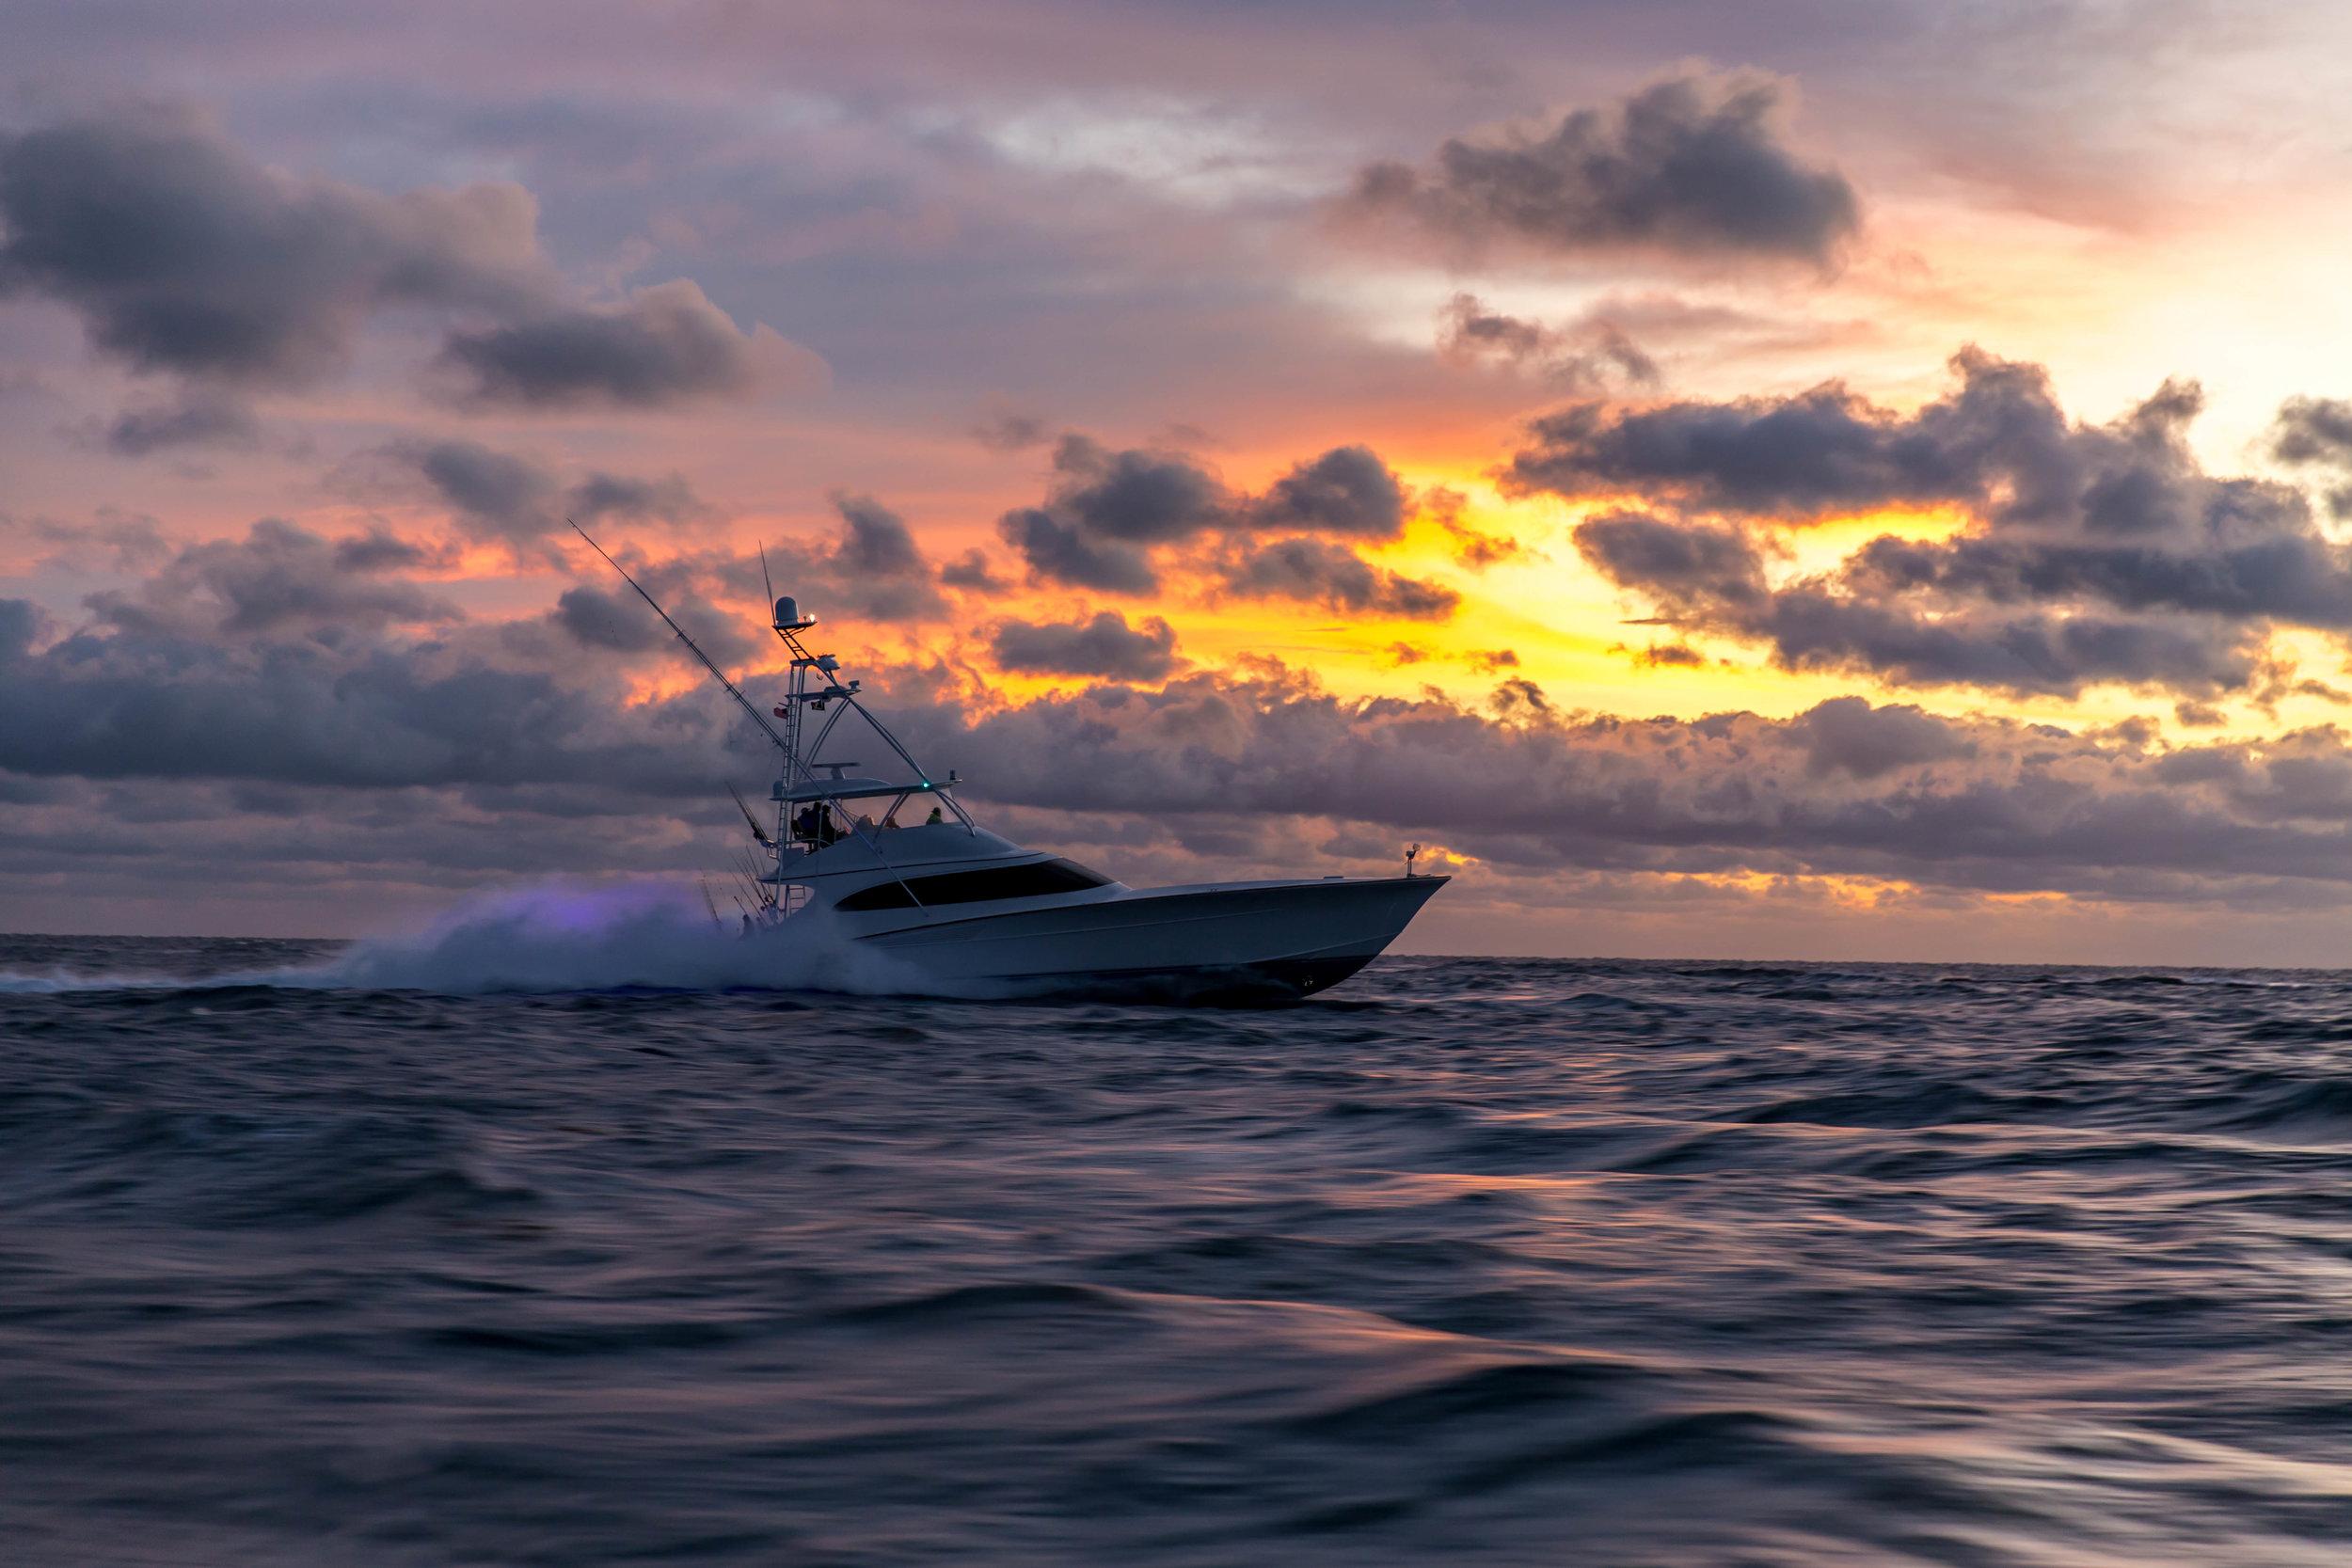 Yates de Pesca Deportiva    Comprar Yate   Vender mi Yate